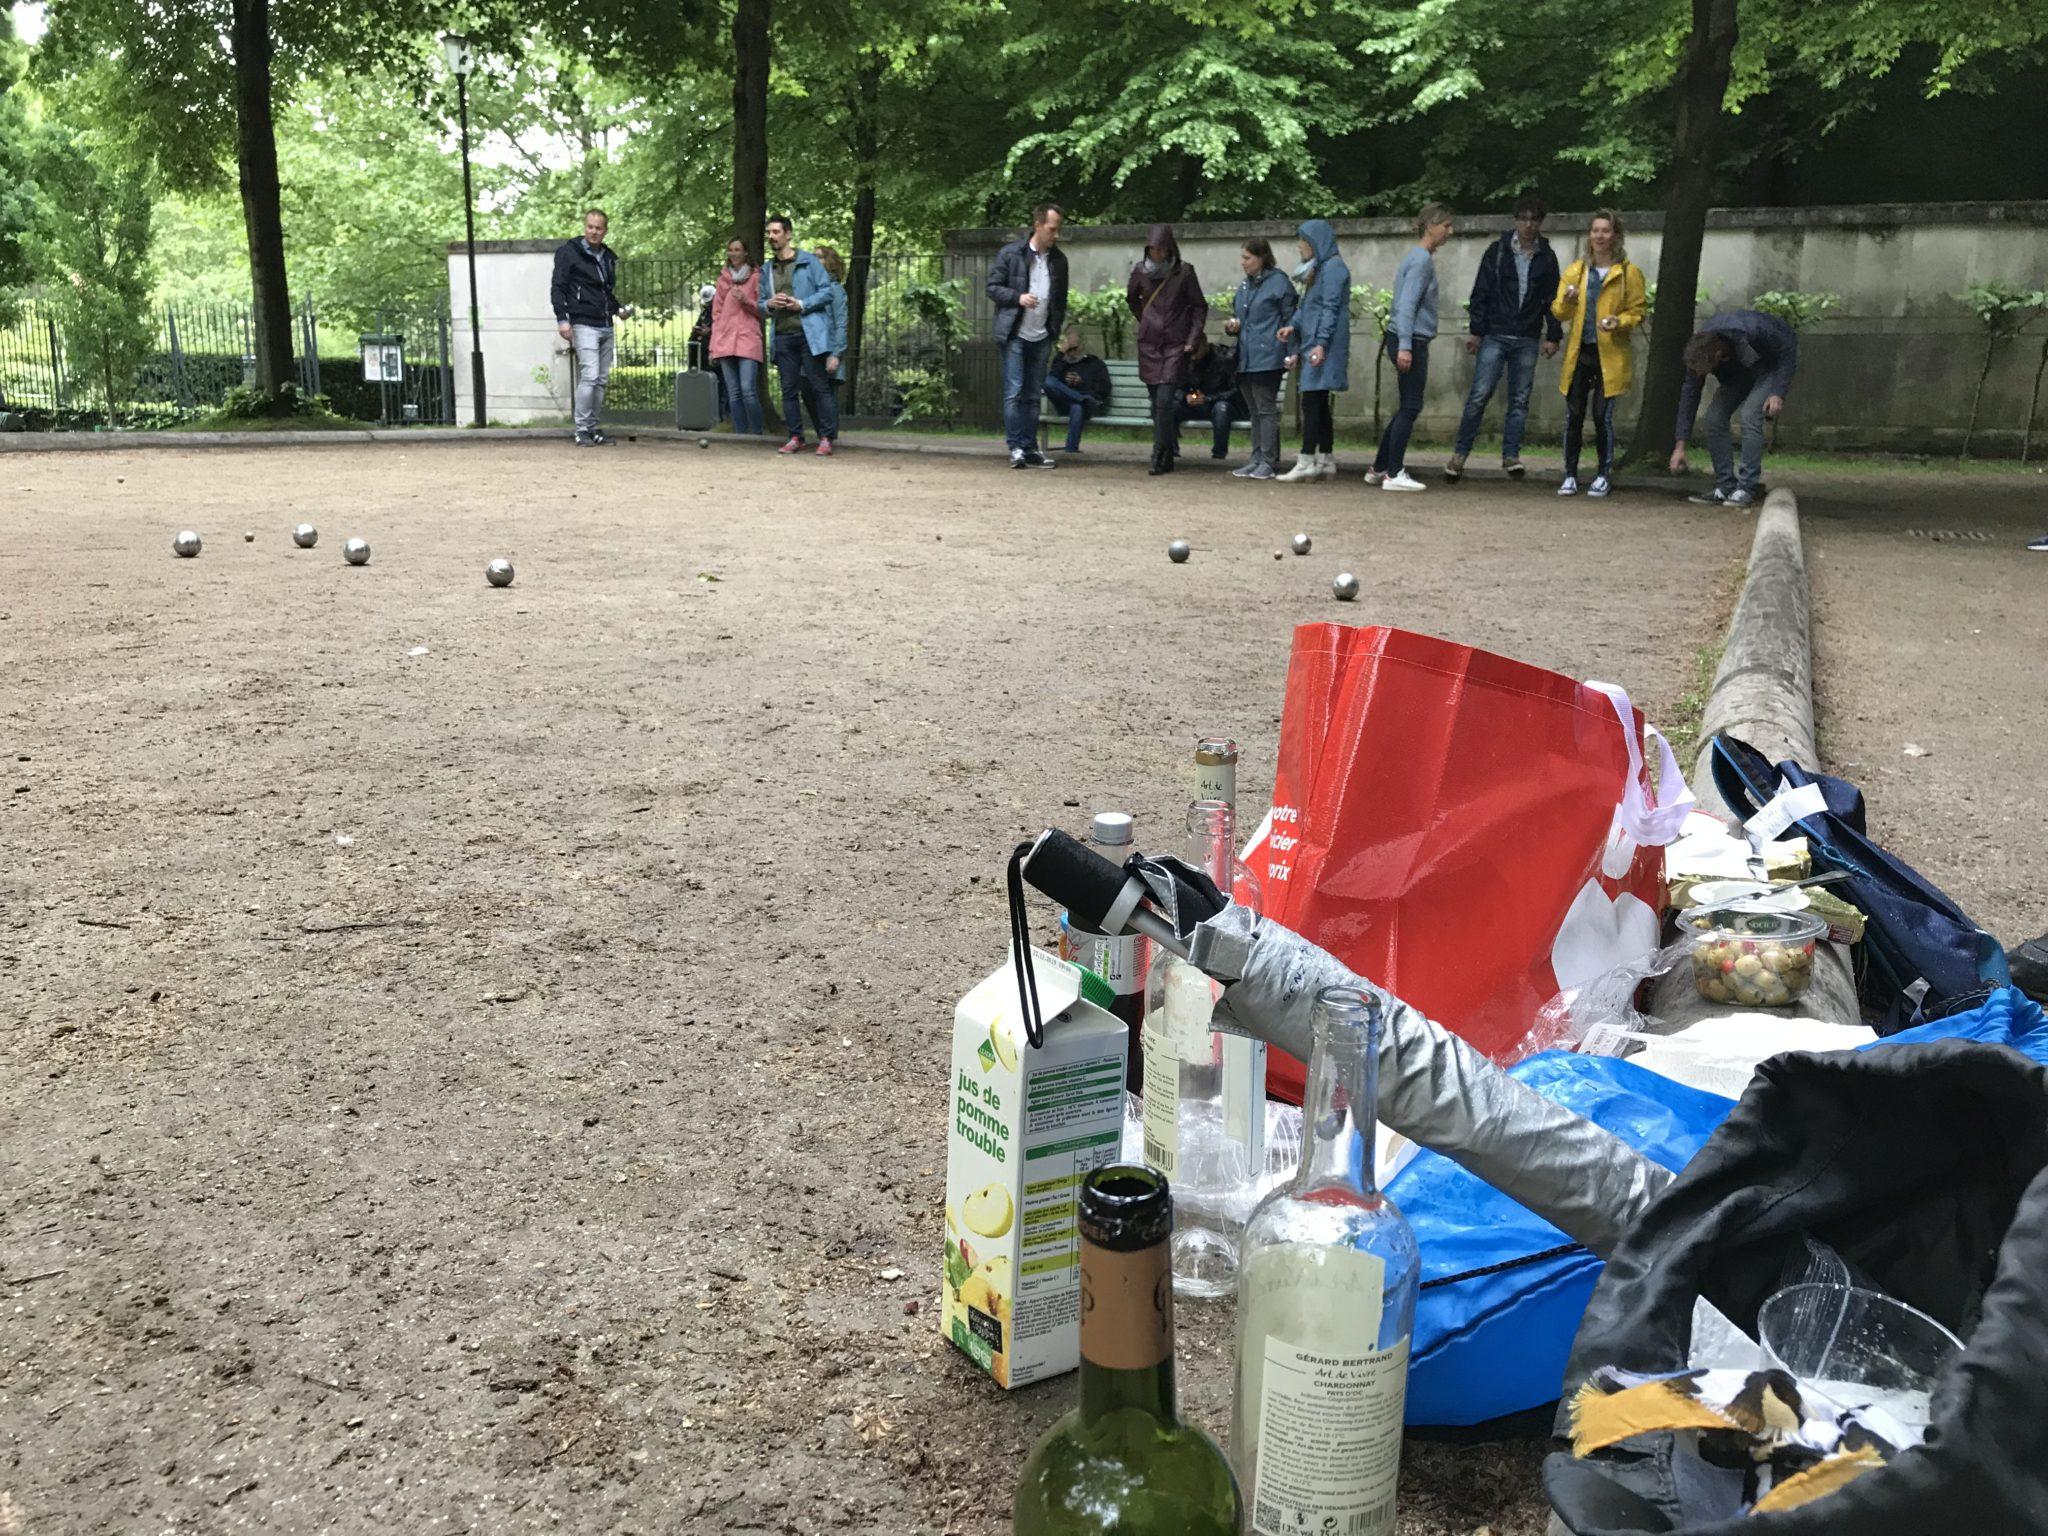 Parijs: Jeu de boules in Parc de Bercy, met vin, pain en fromage